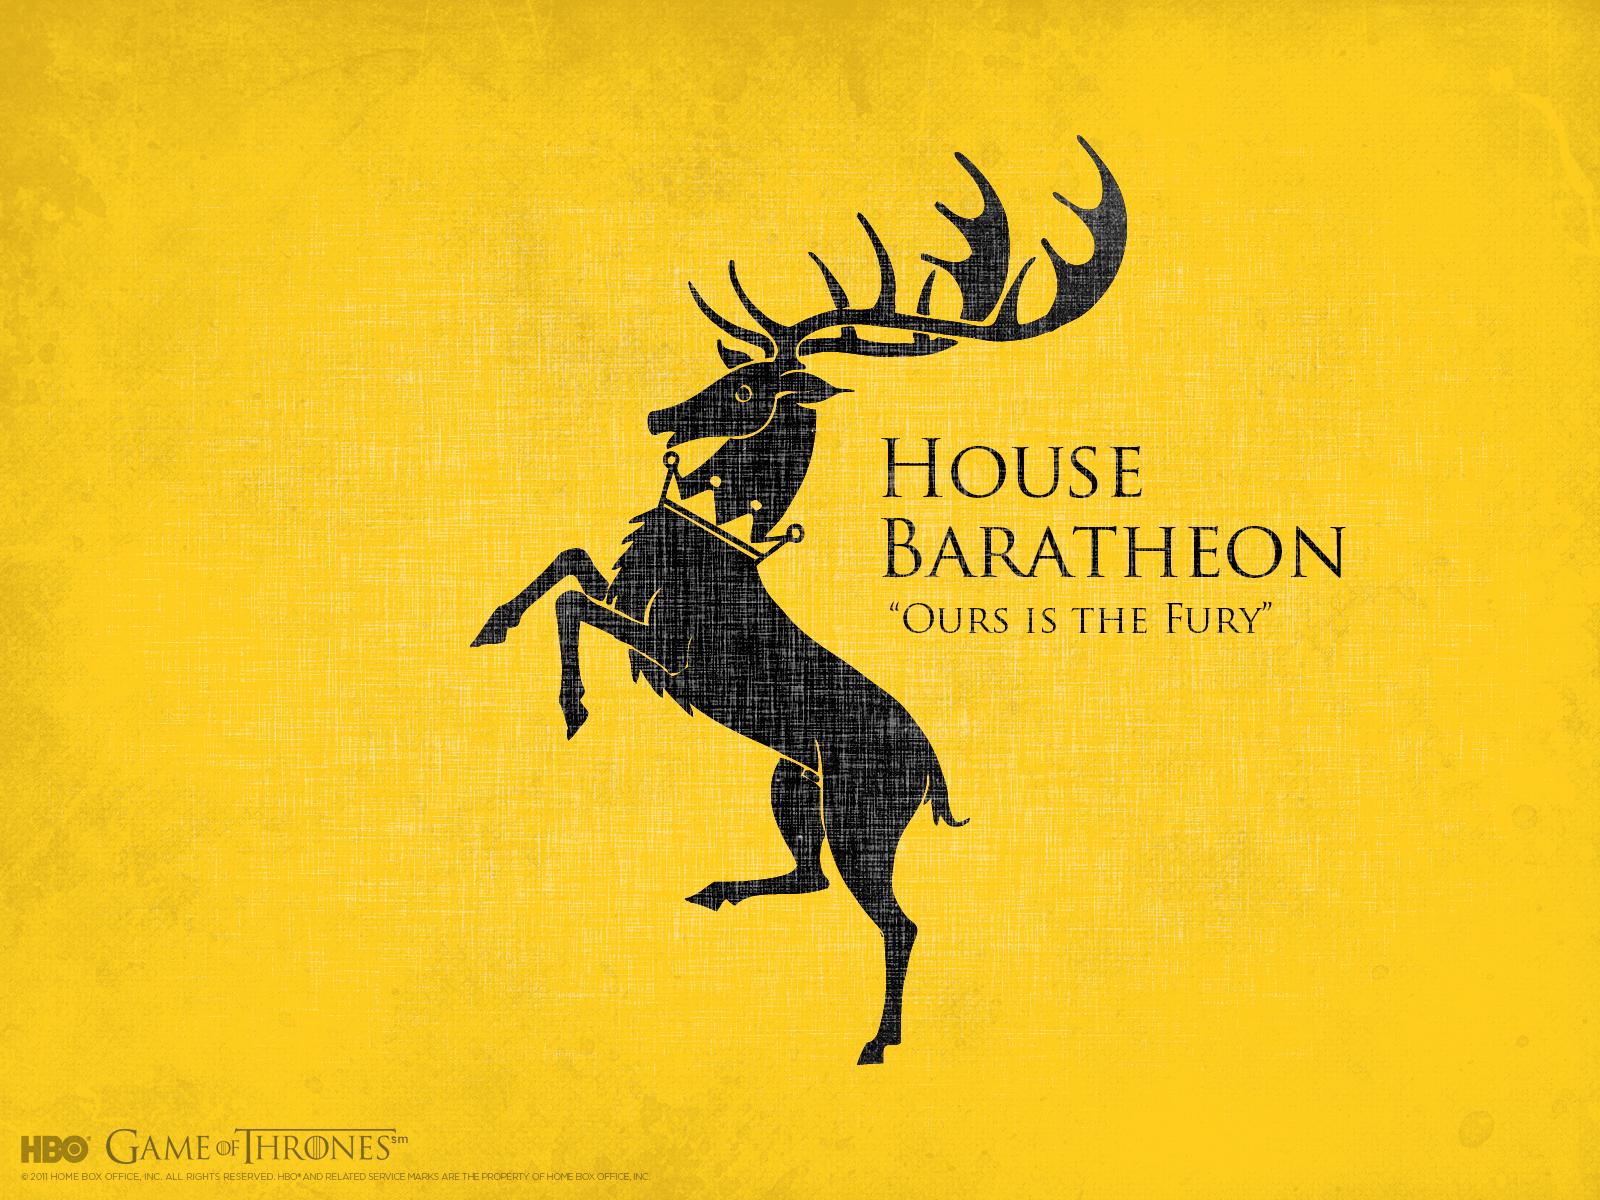 Game of Thrones Wallpapers HD   Taringa 1600x1200